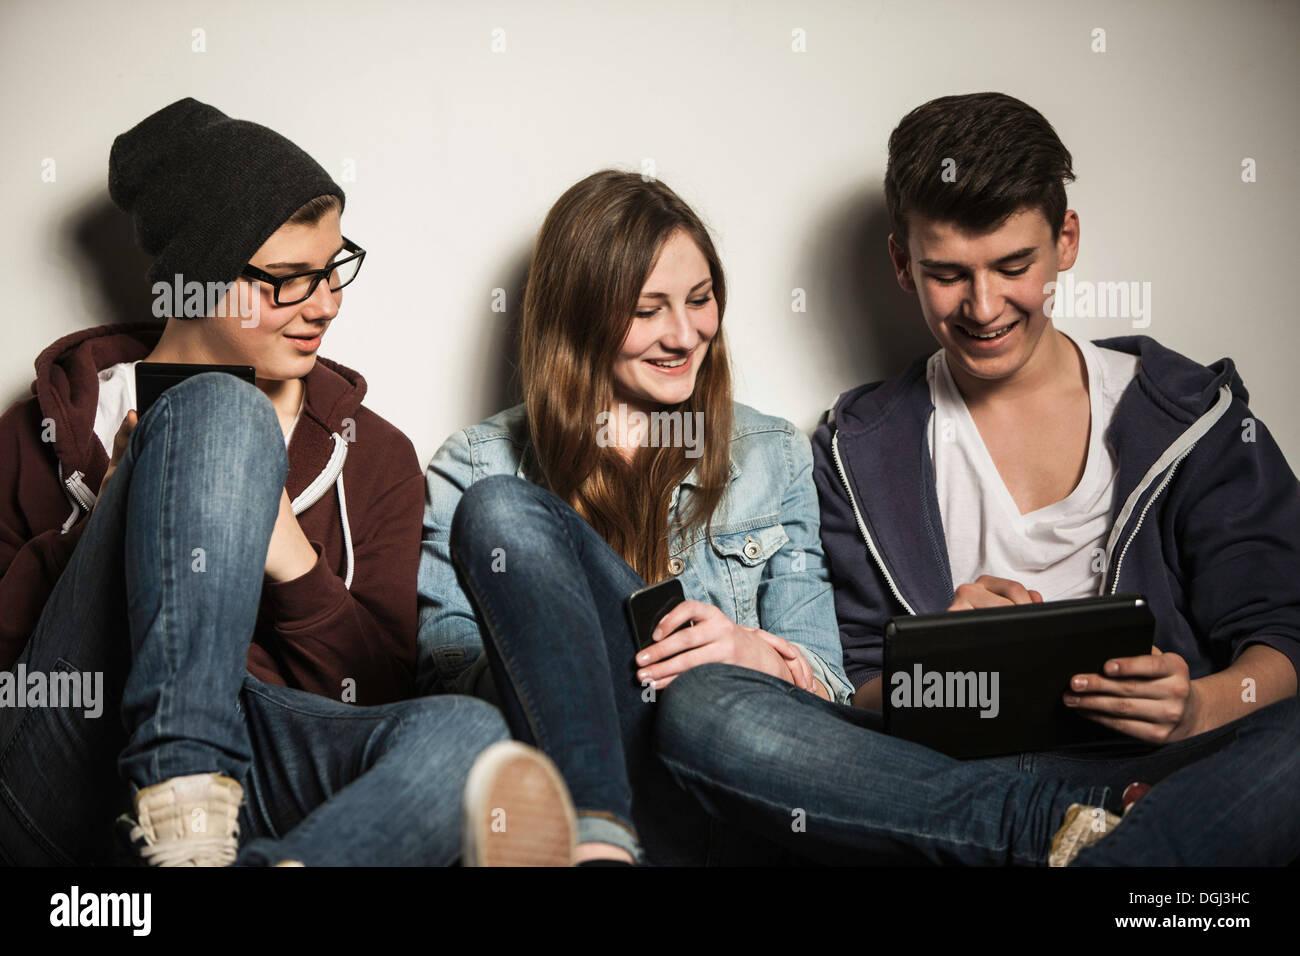 Les adolescents using digital tablet Photo Stock